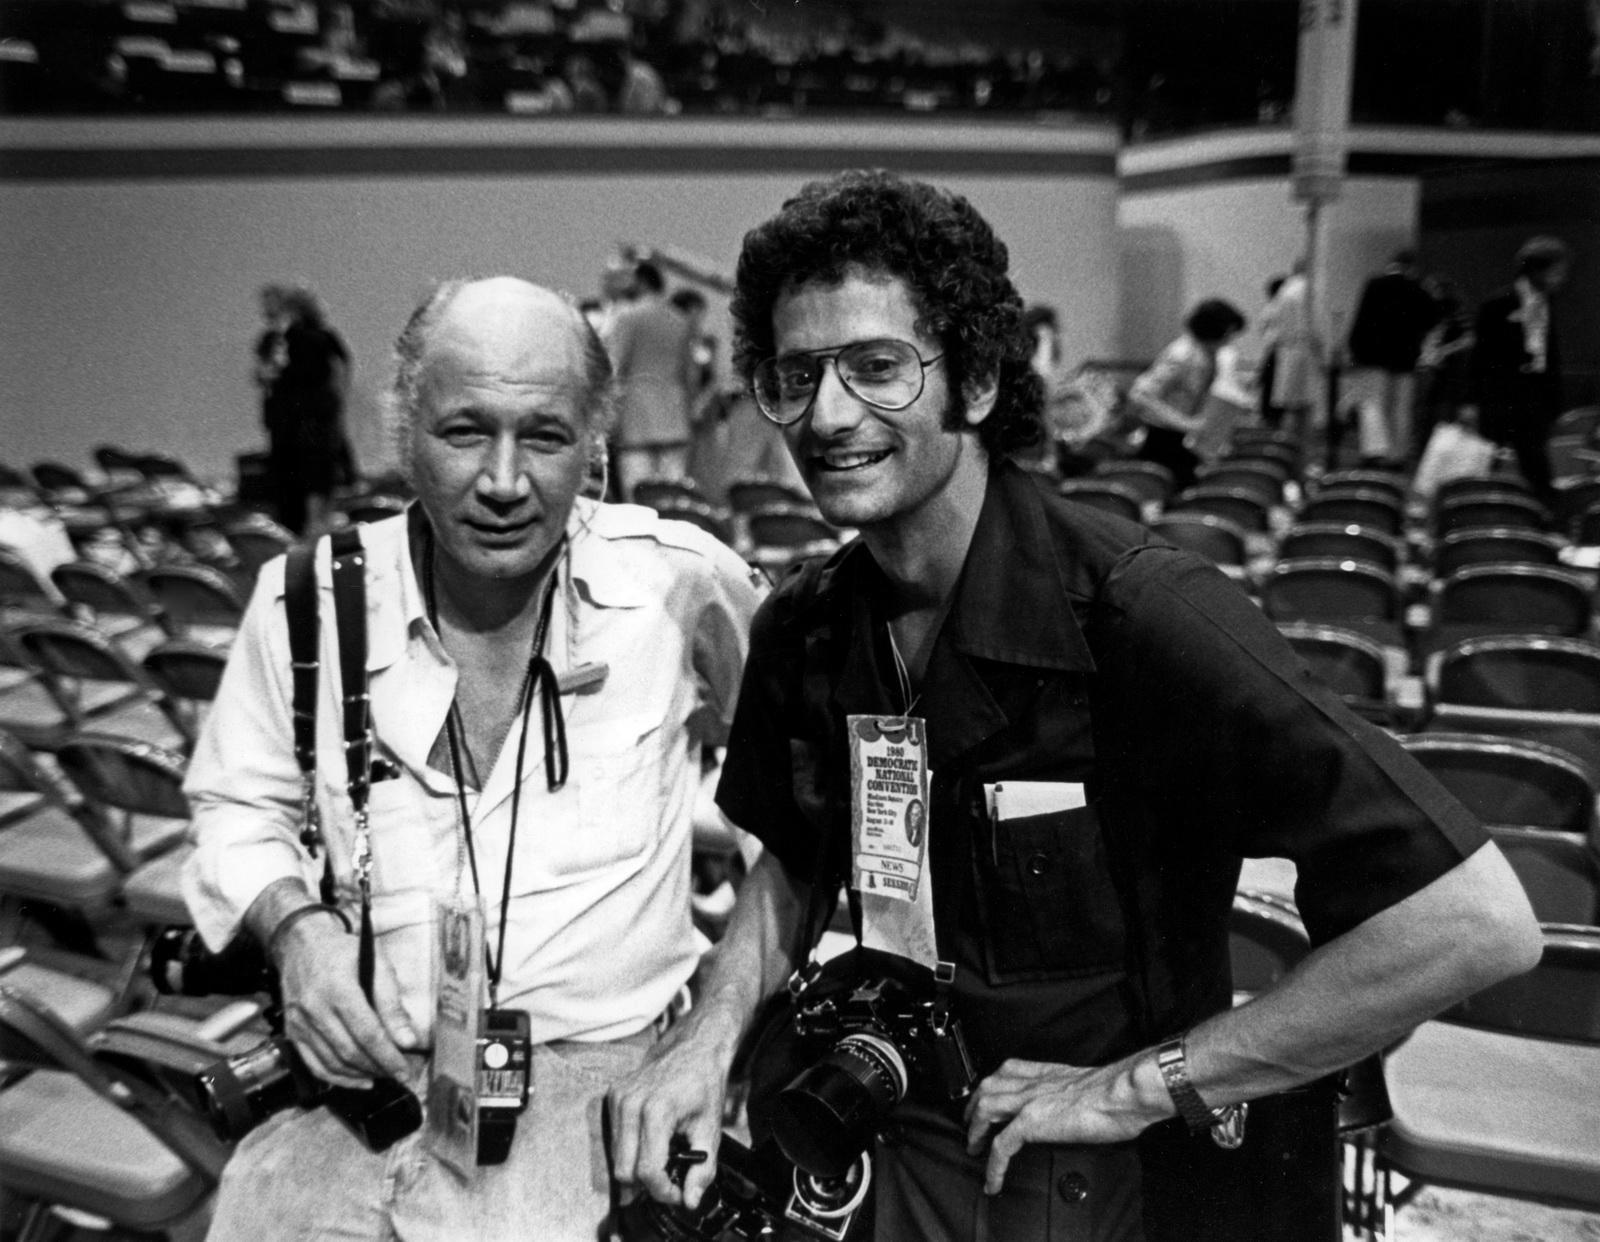 Eddie Adams and David Burnett at the 1980 Democratic Convention. © Keith Skelton